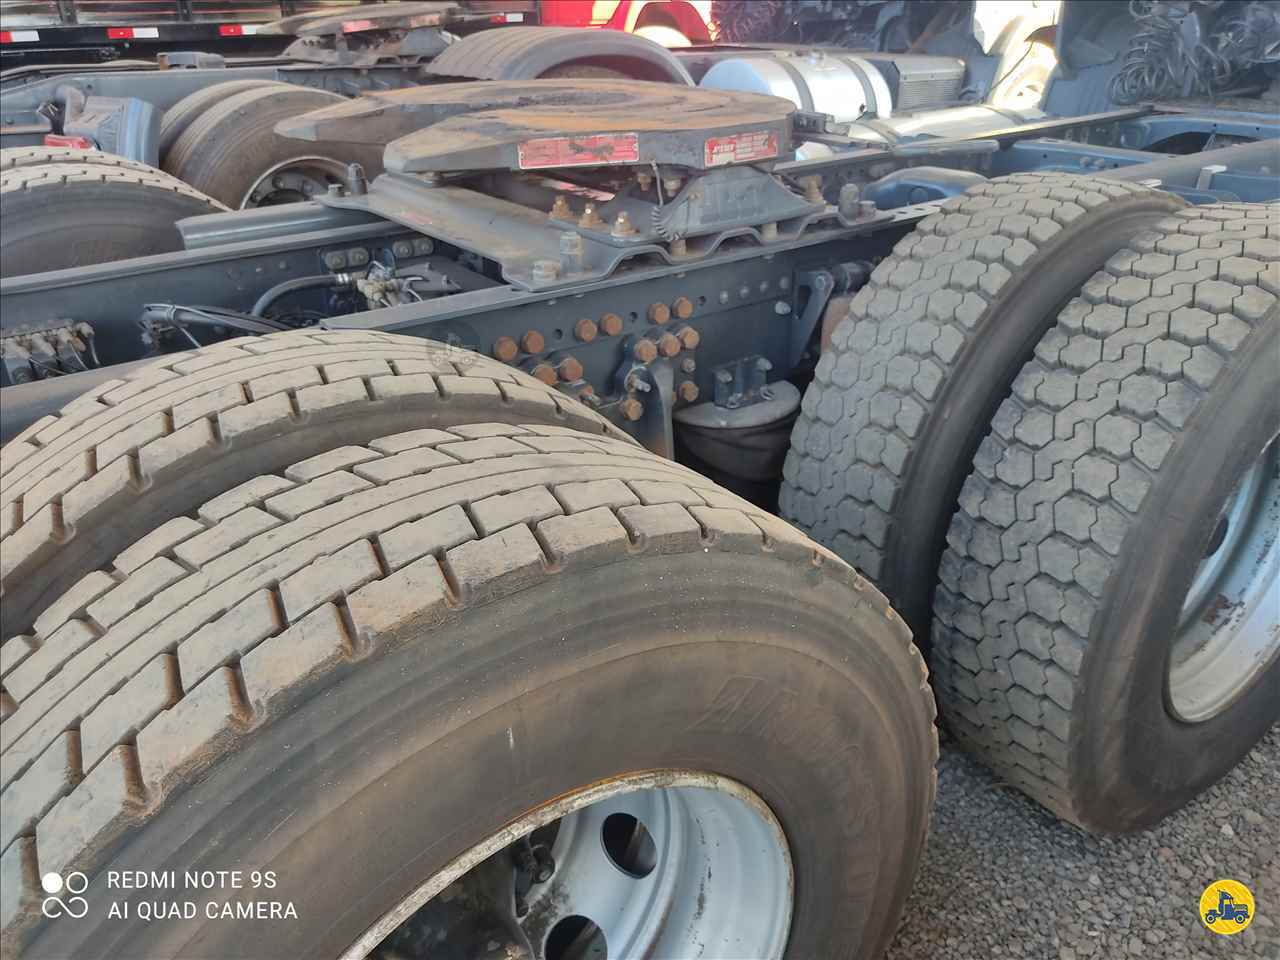 SCANIA SCANIA 420 100km 2011/2012 Rodomati Caminhões